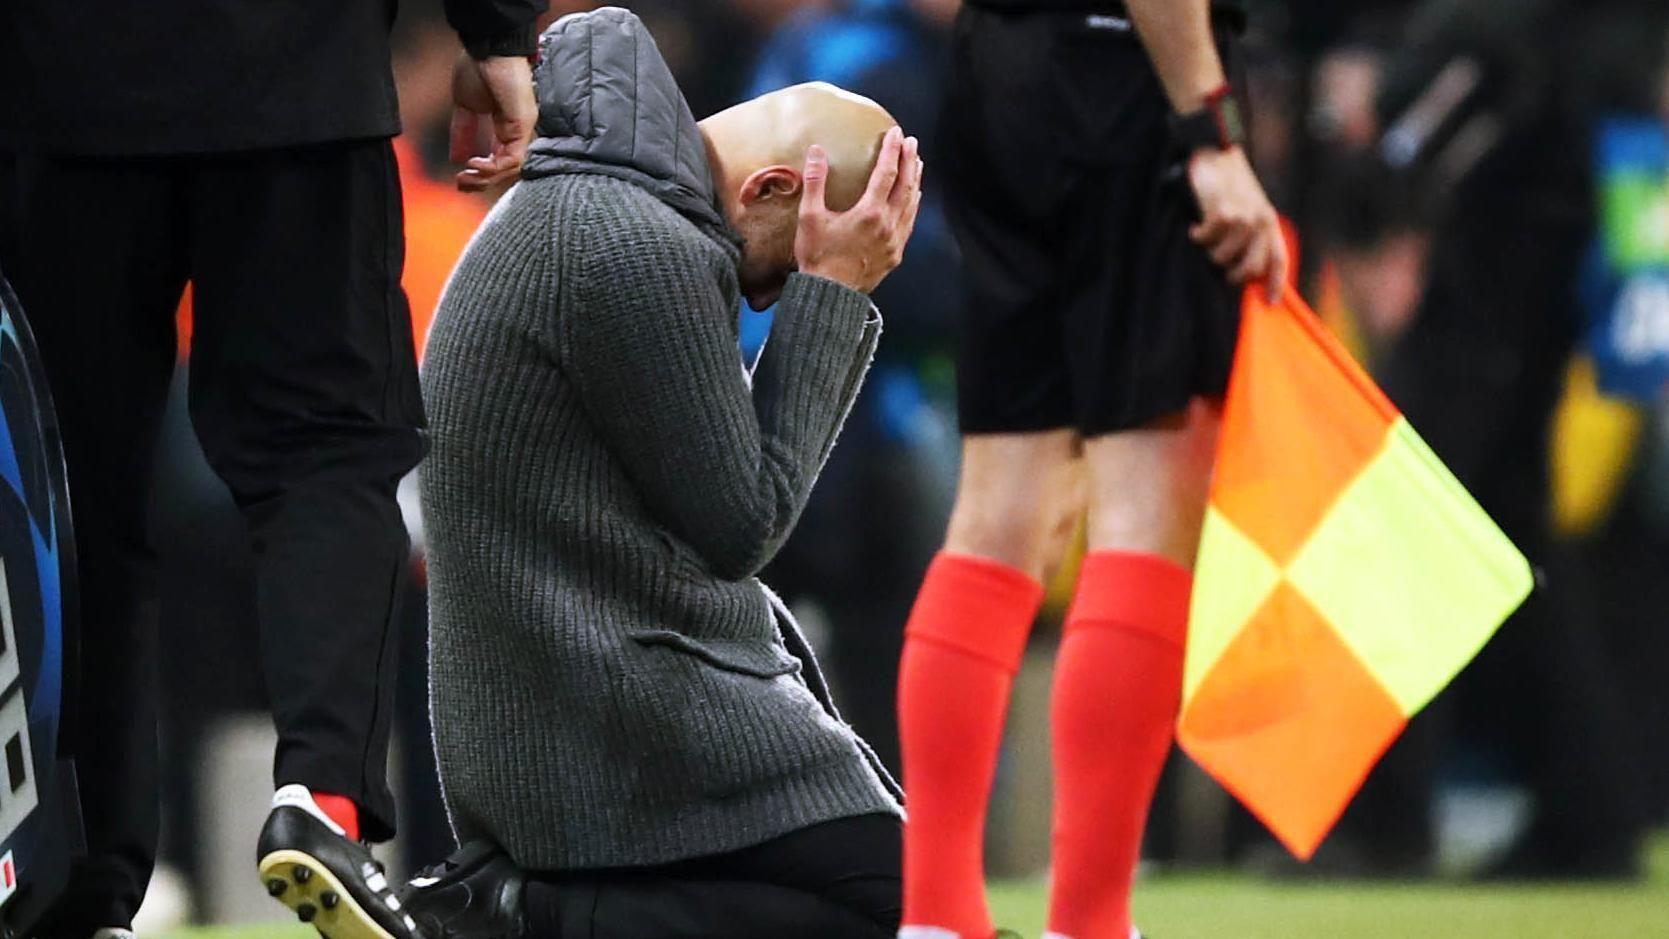 Is Pep Guardiola a fraud?